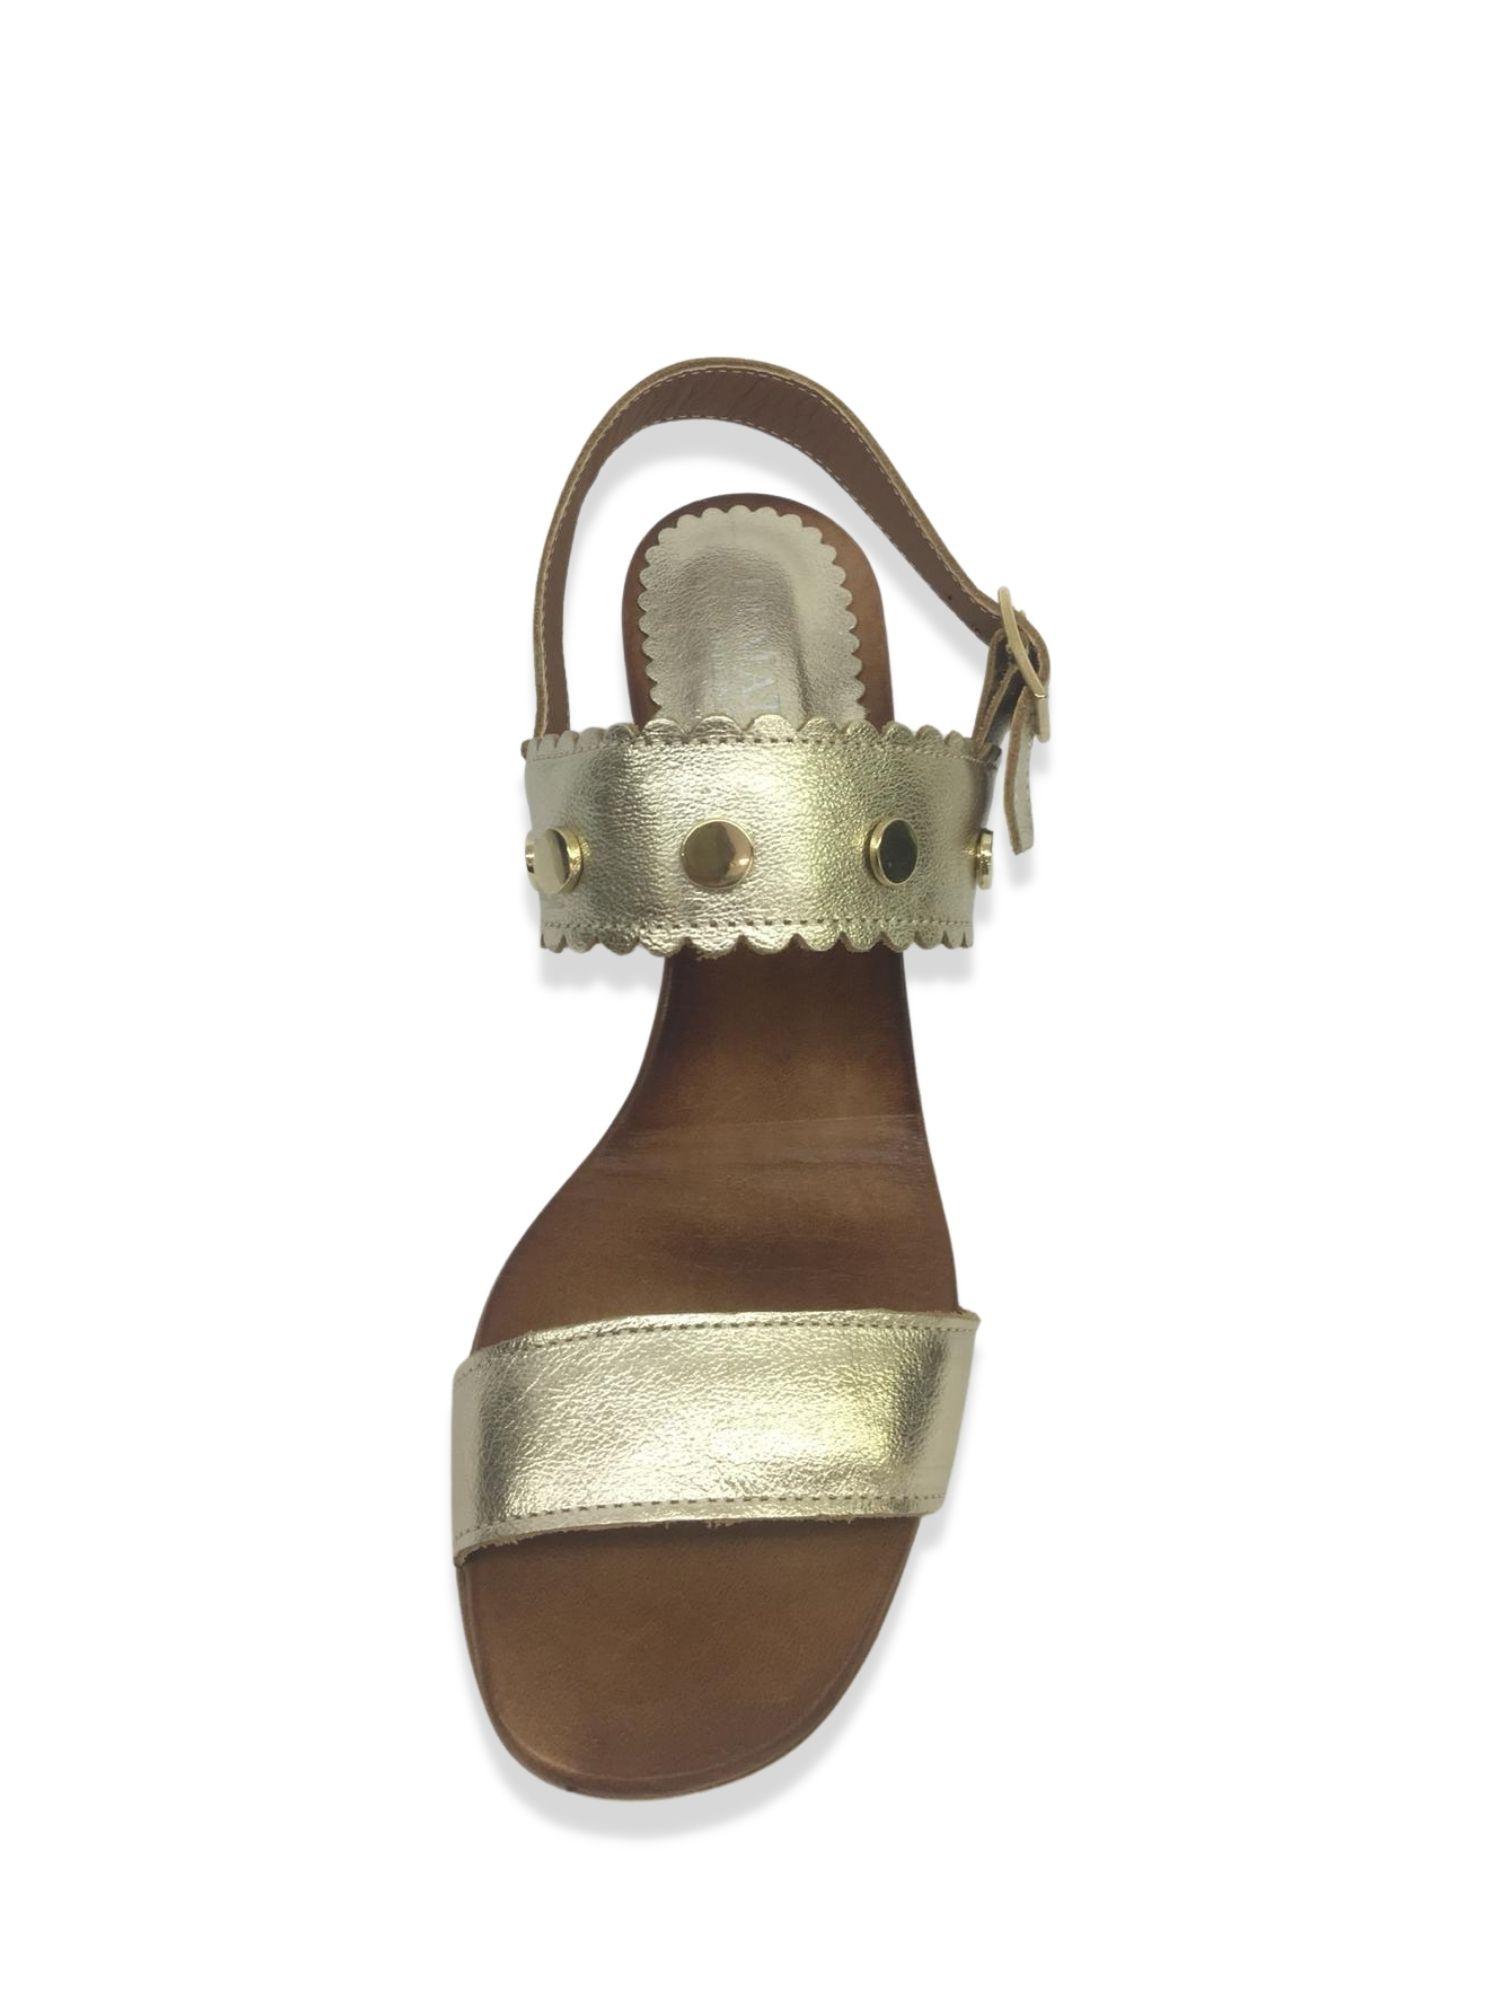 Sandalo Made in Italy 101 Platino alto